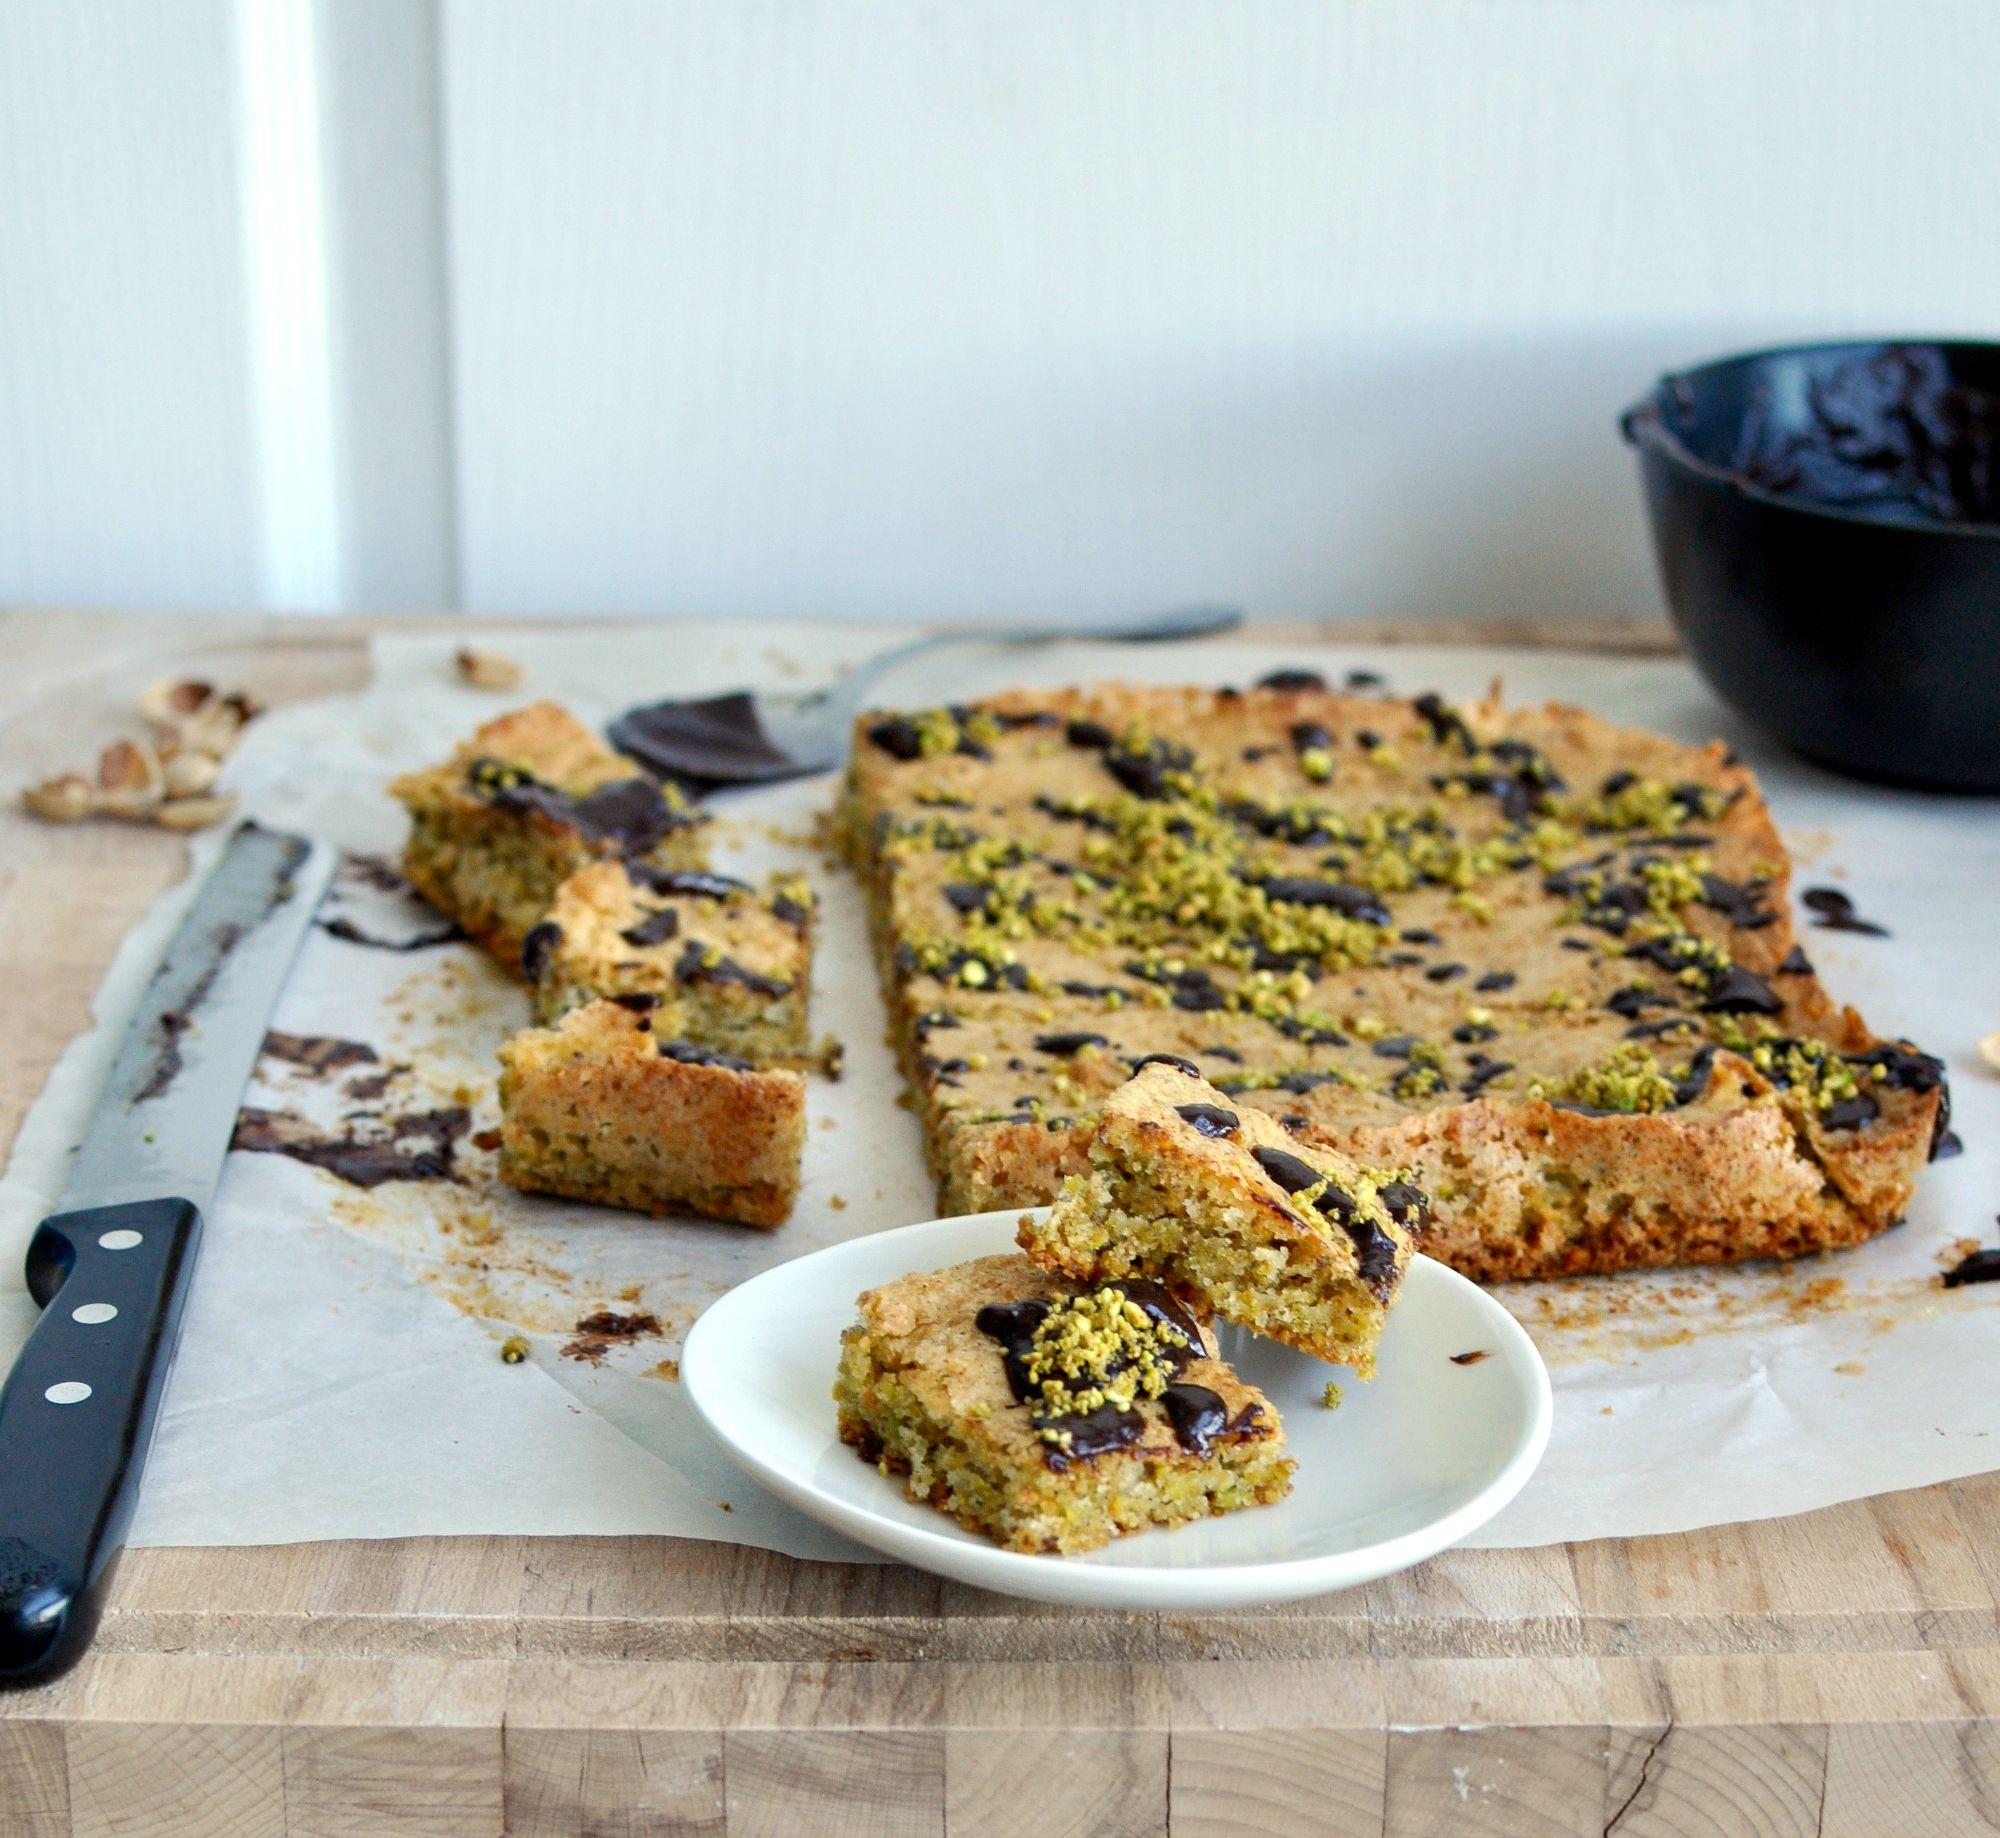 pistachio cardamom cake